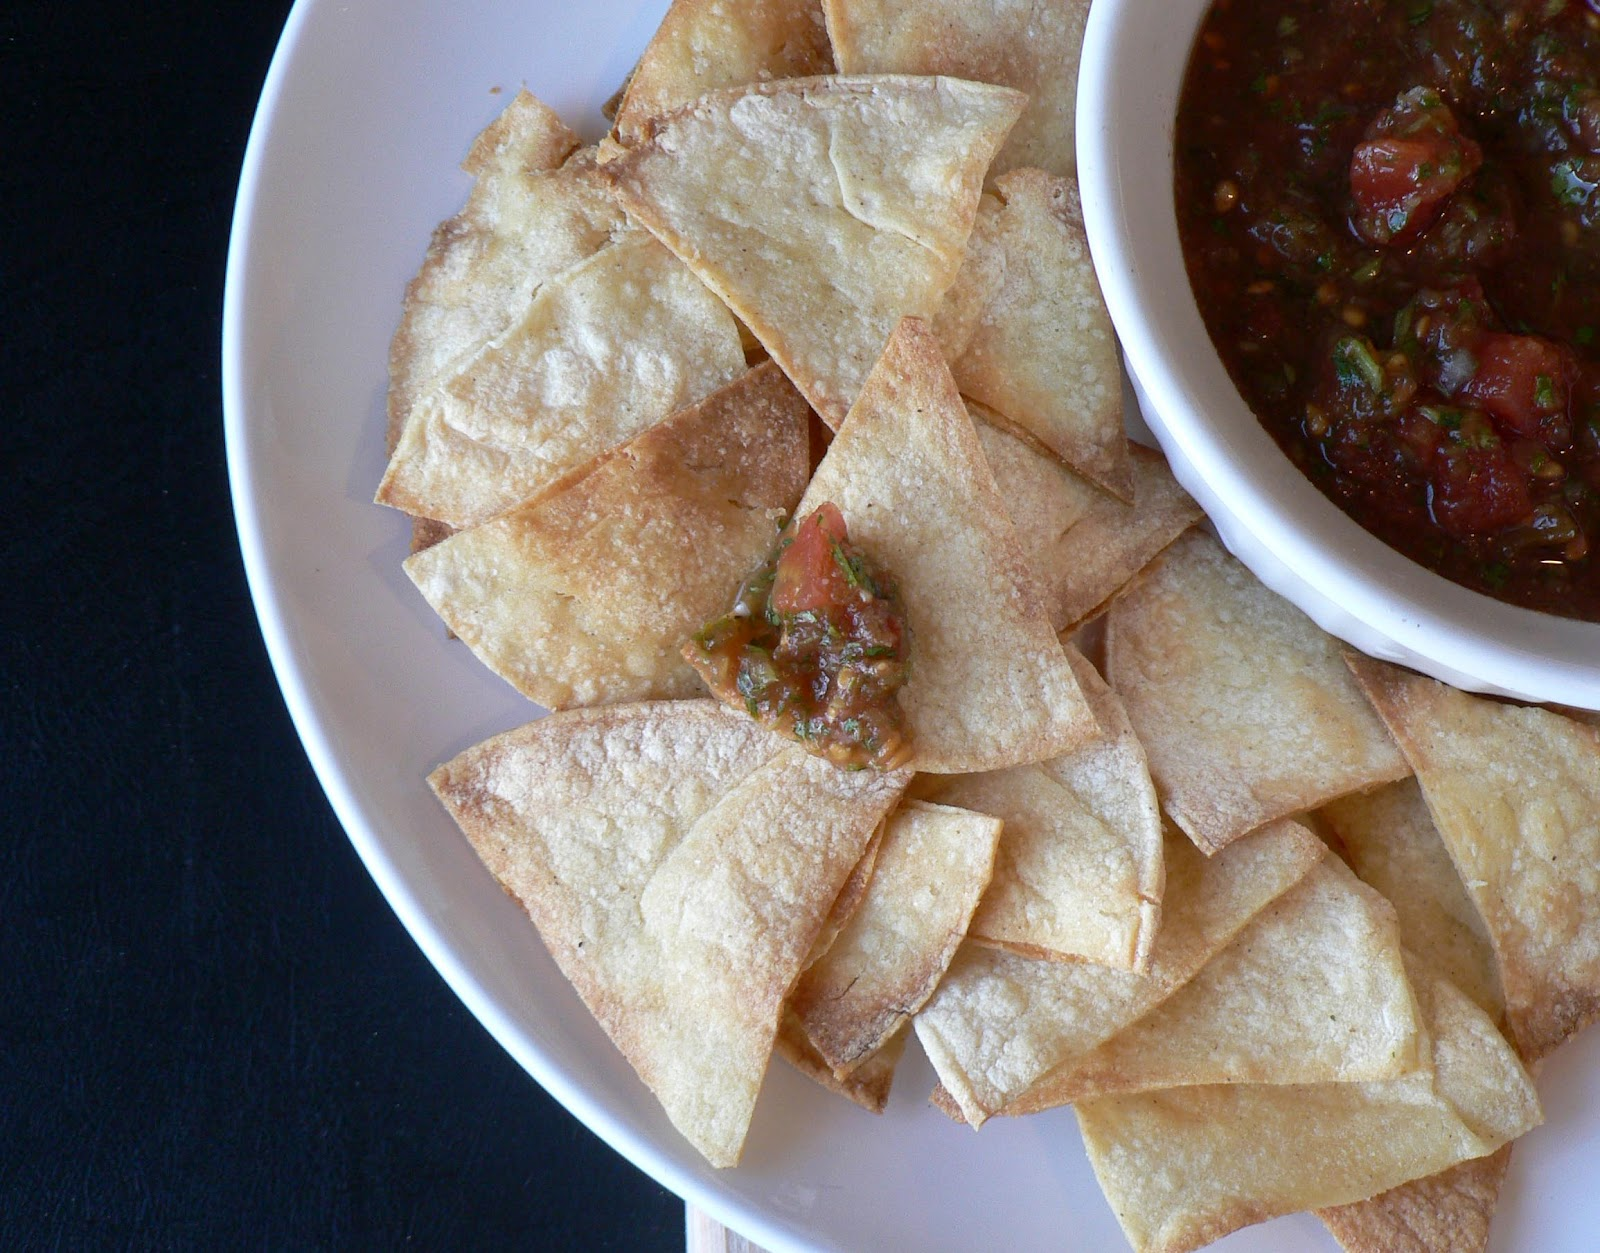 Homemade Baked Corn Tortilla Chips - Bless This Mess